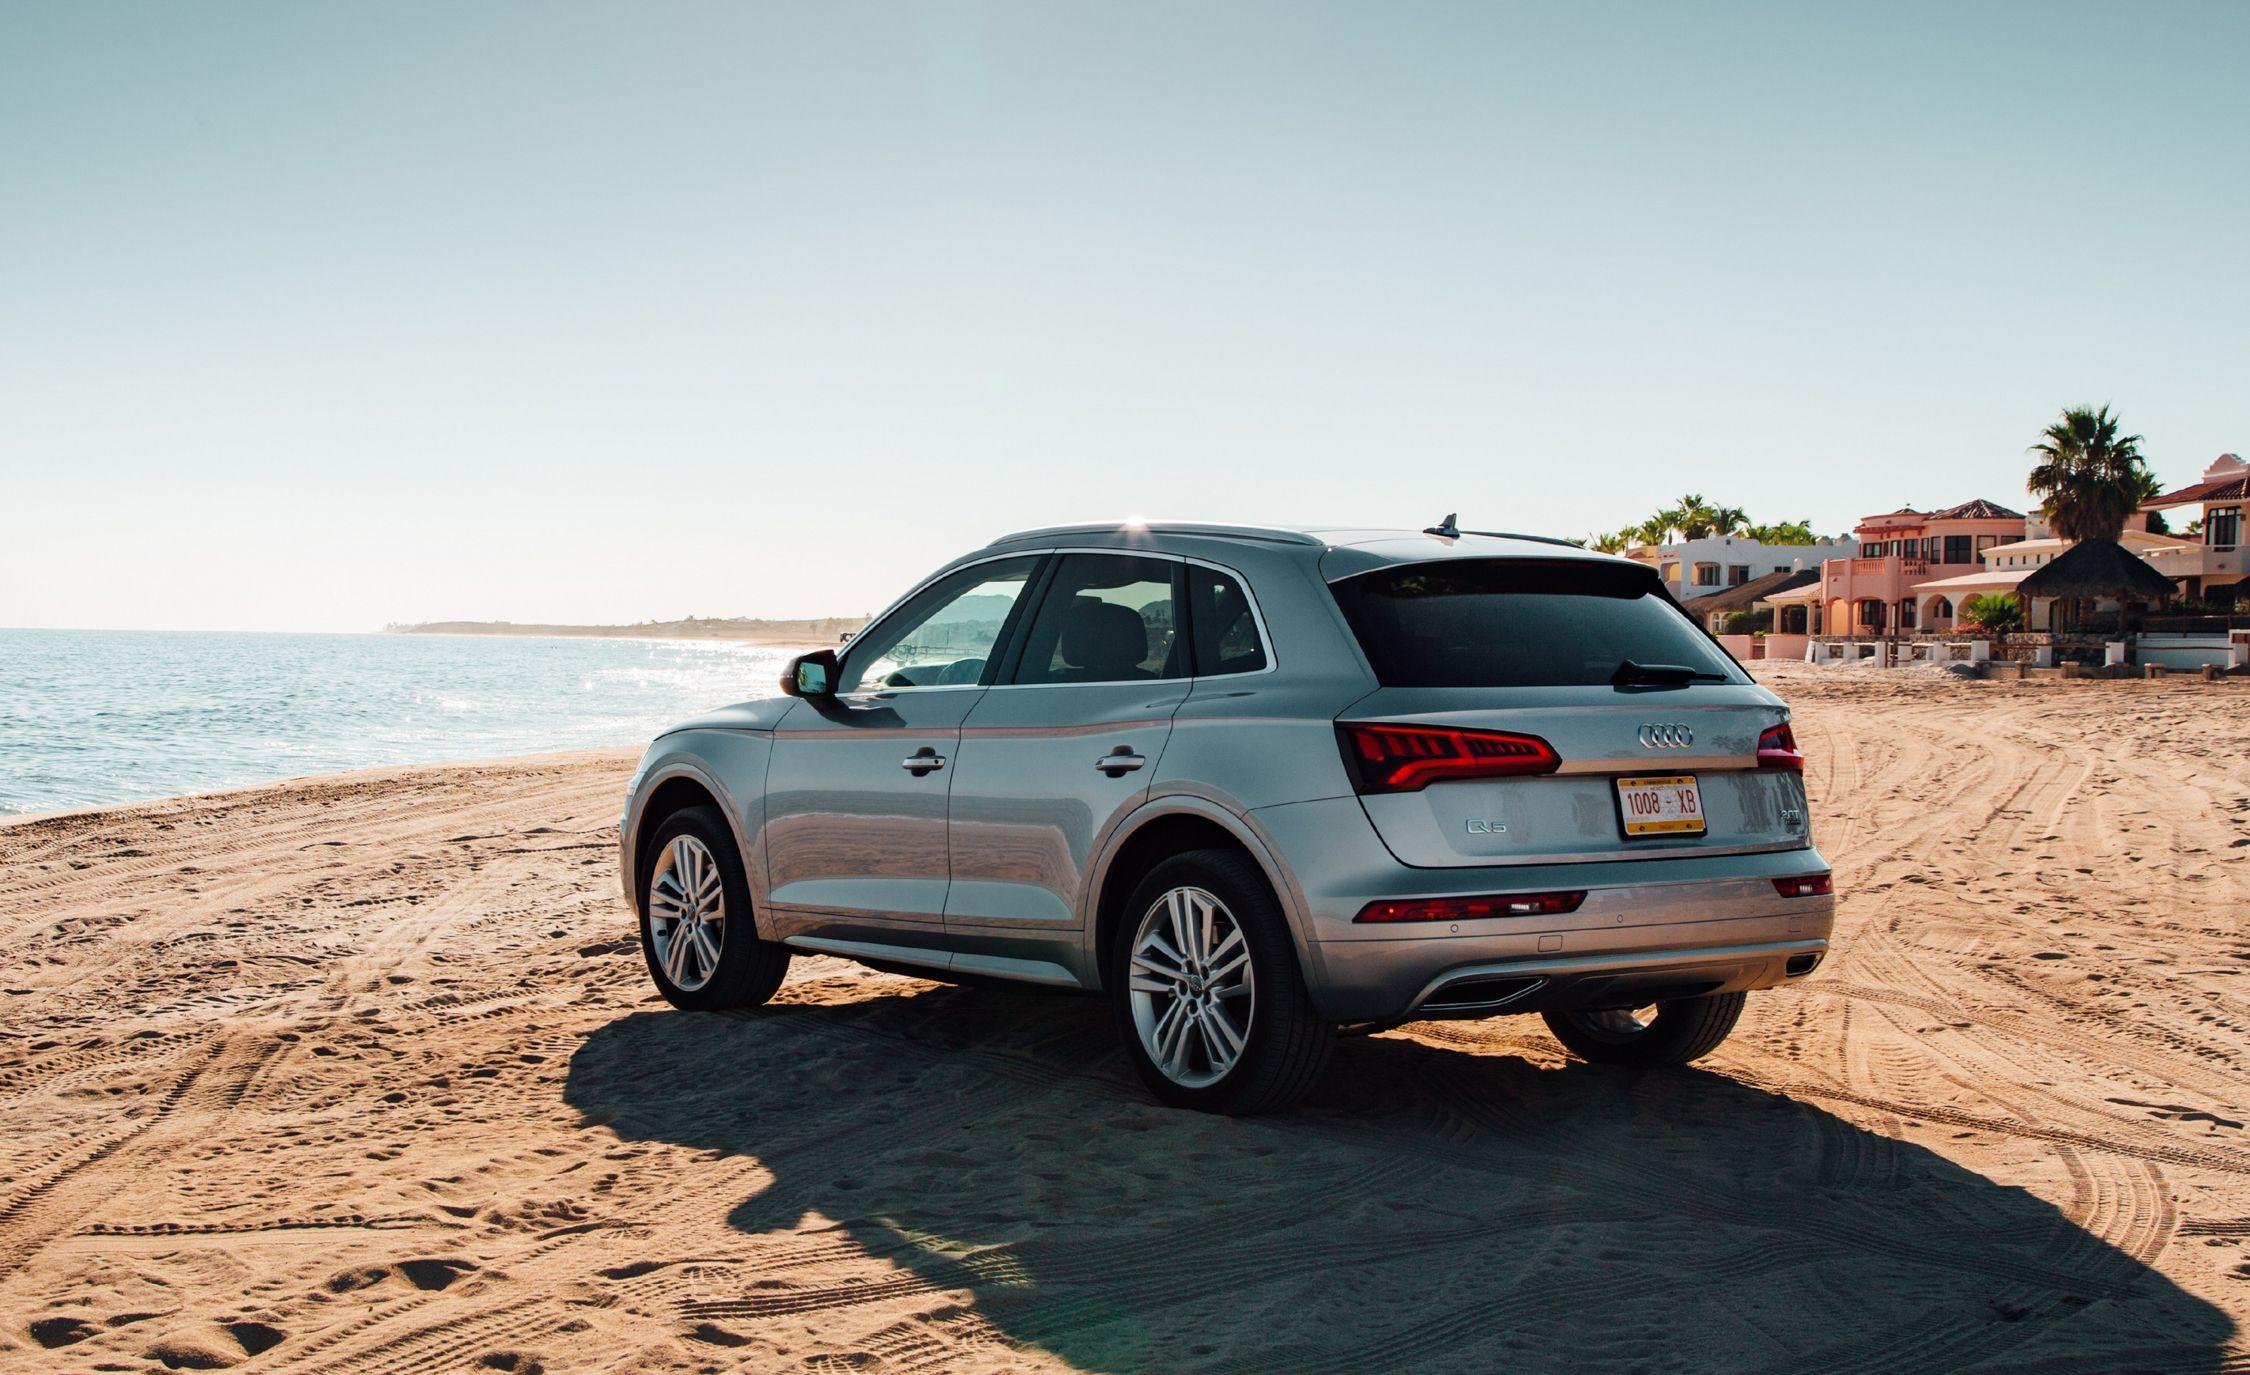 Audi Q Reviews Audi Q Price Photos And Specs Car And Driver - Audi 5 car